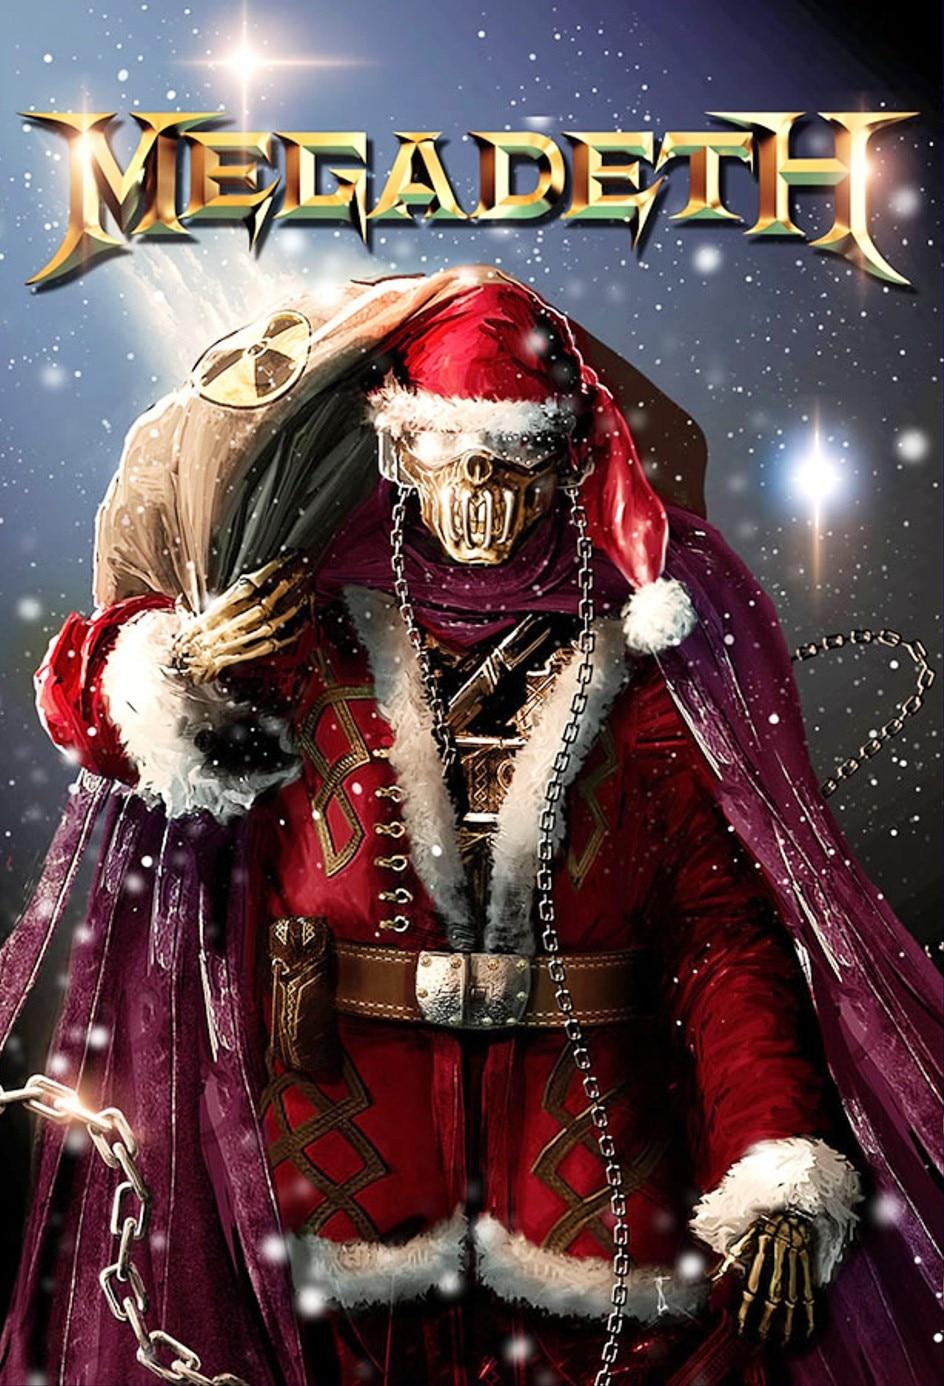 Megadeth Poster - Compra lotes baratos de Megadeth Poster ...